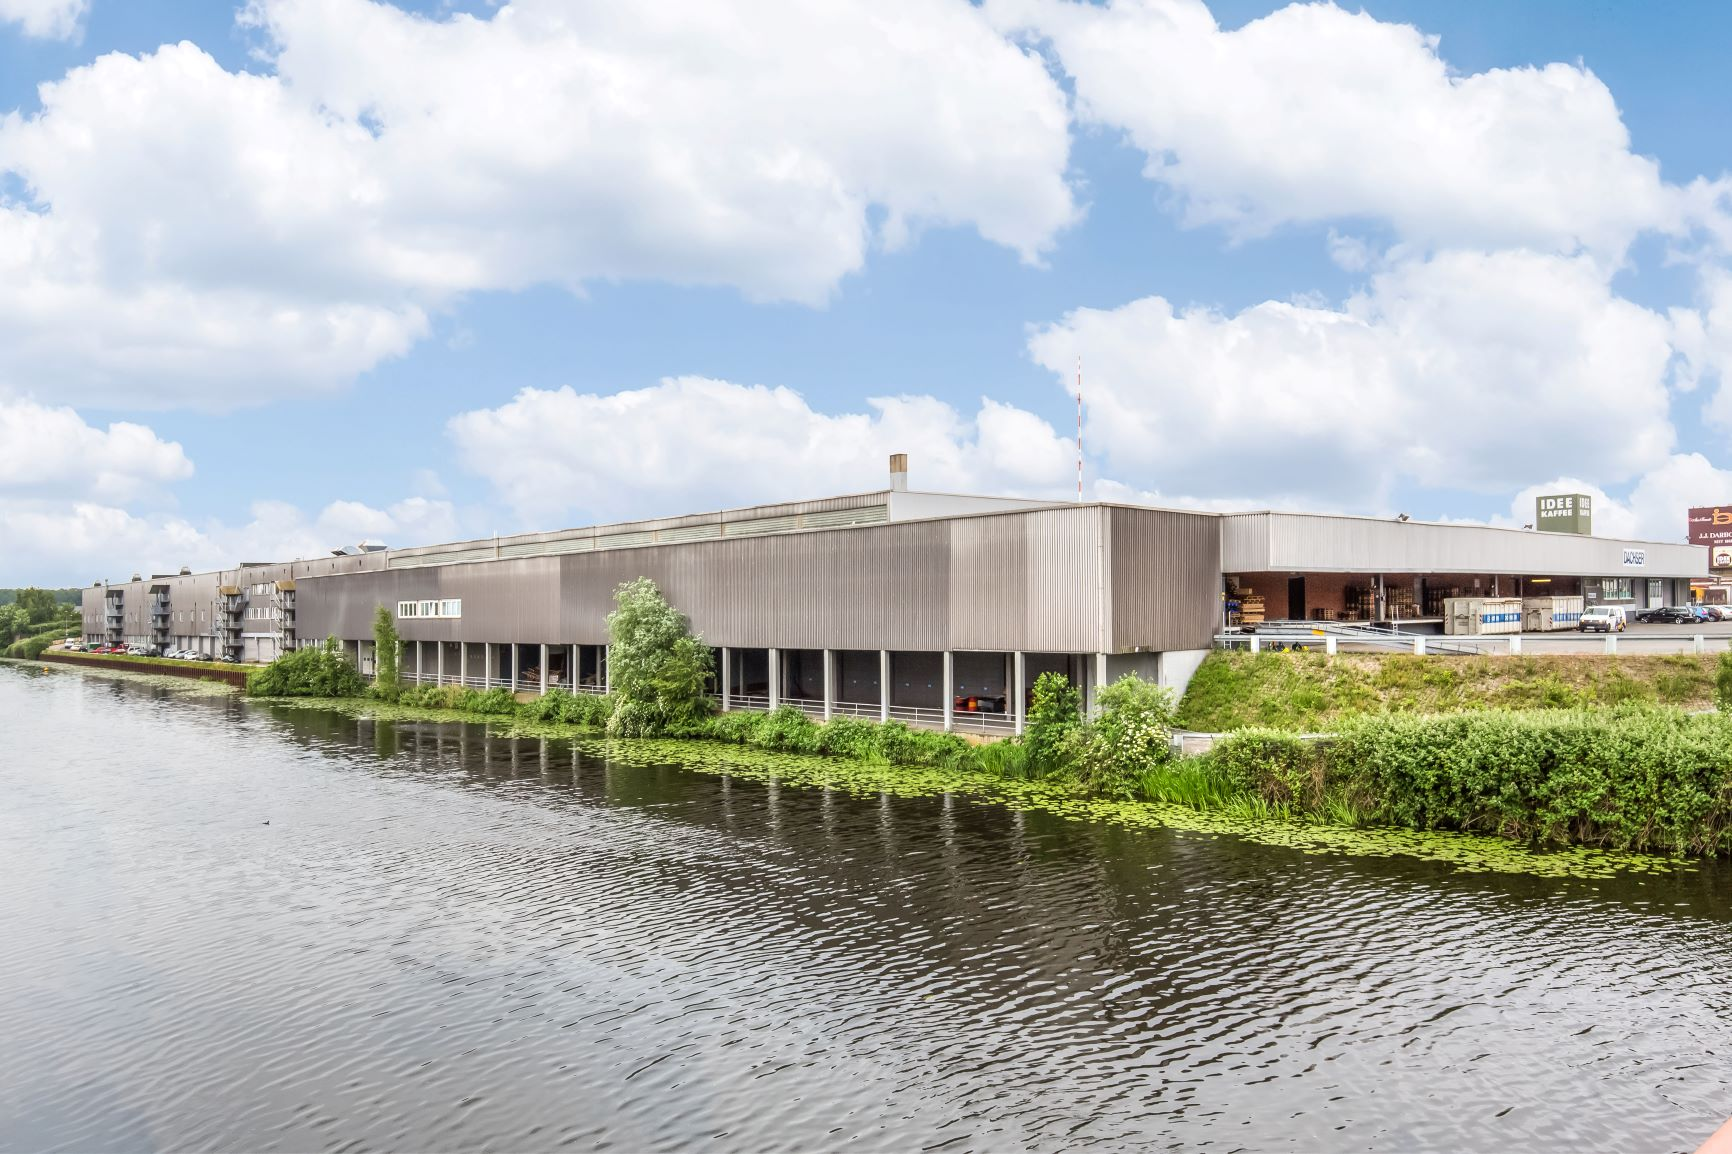 Über 5.000 m² in Logistikimmobilie in Metropolregion Hamburg vermietet / More than 5,000 m² leased in logistics property in Hamburg metropolitan region